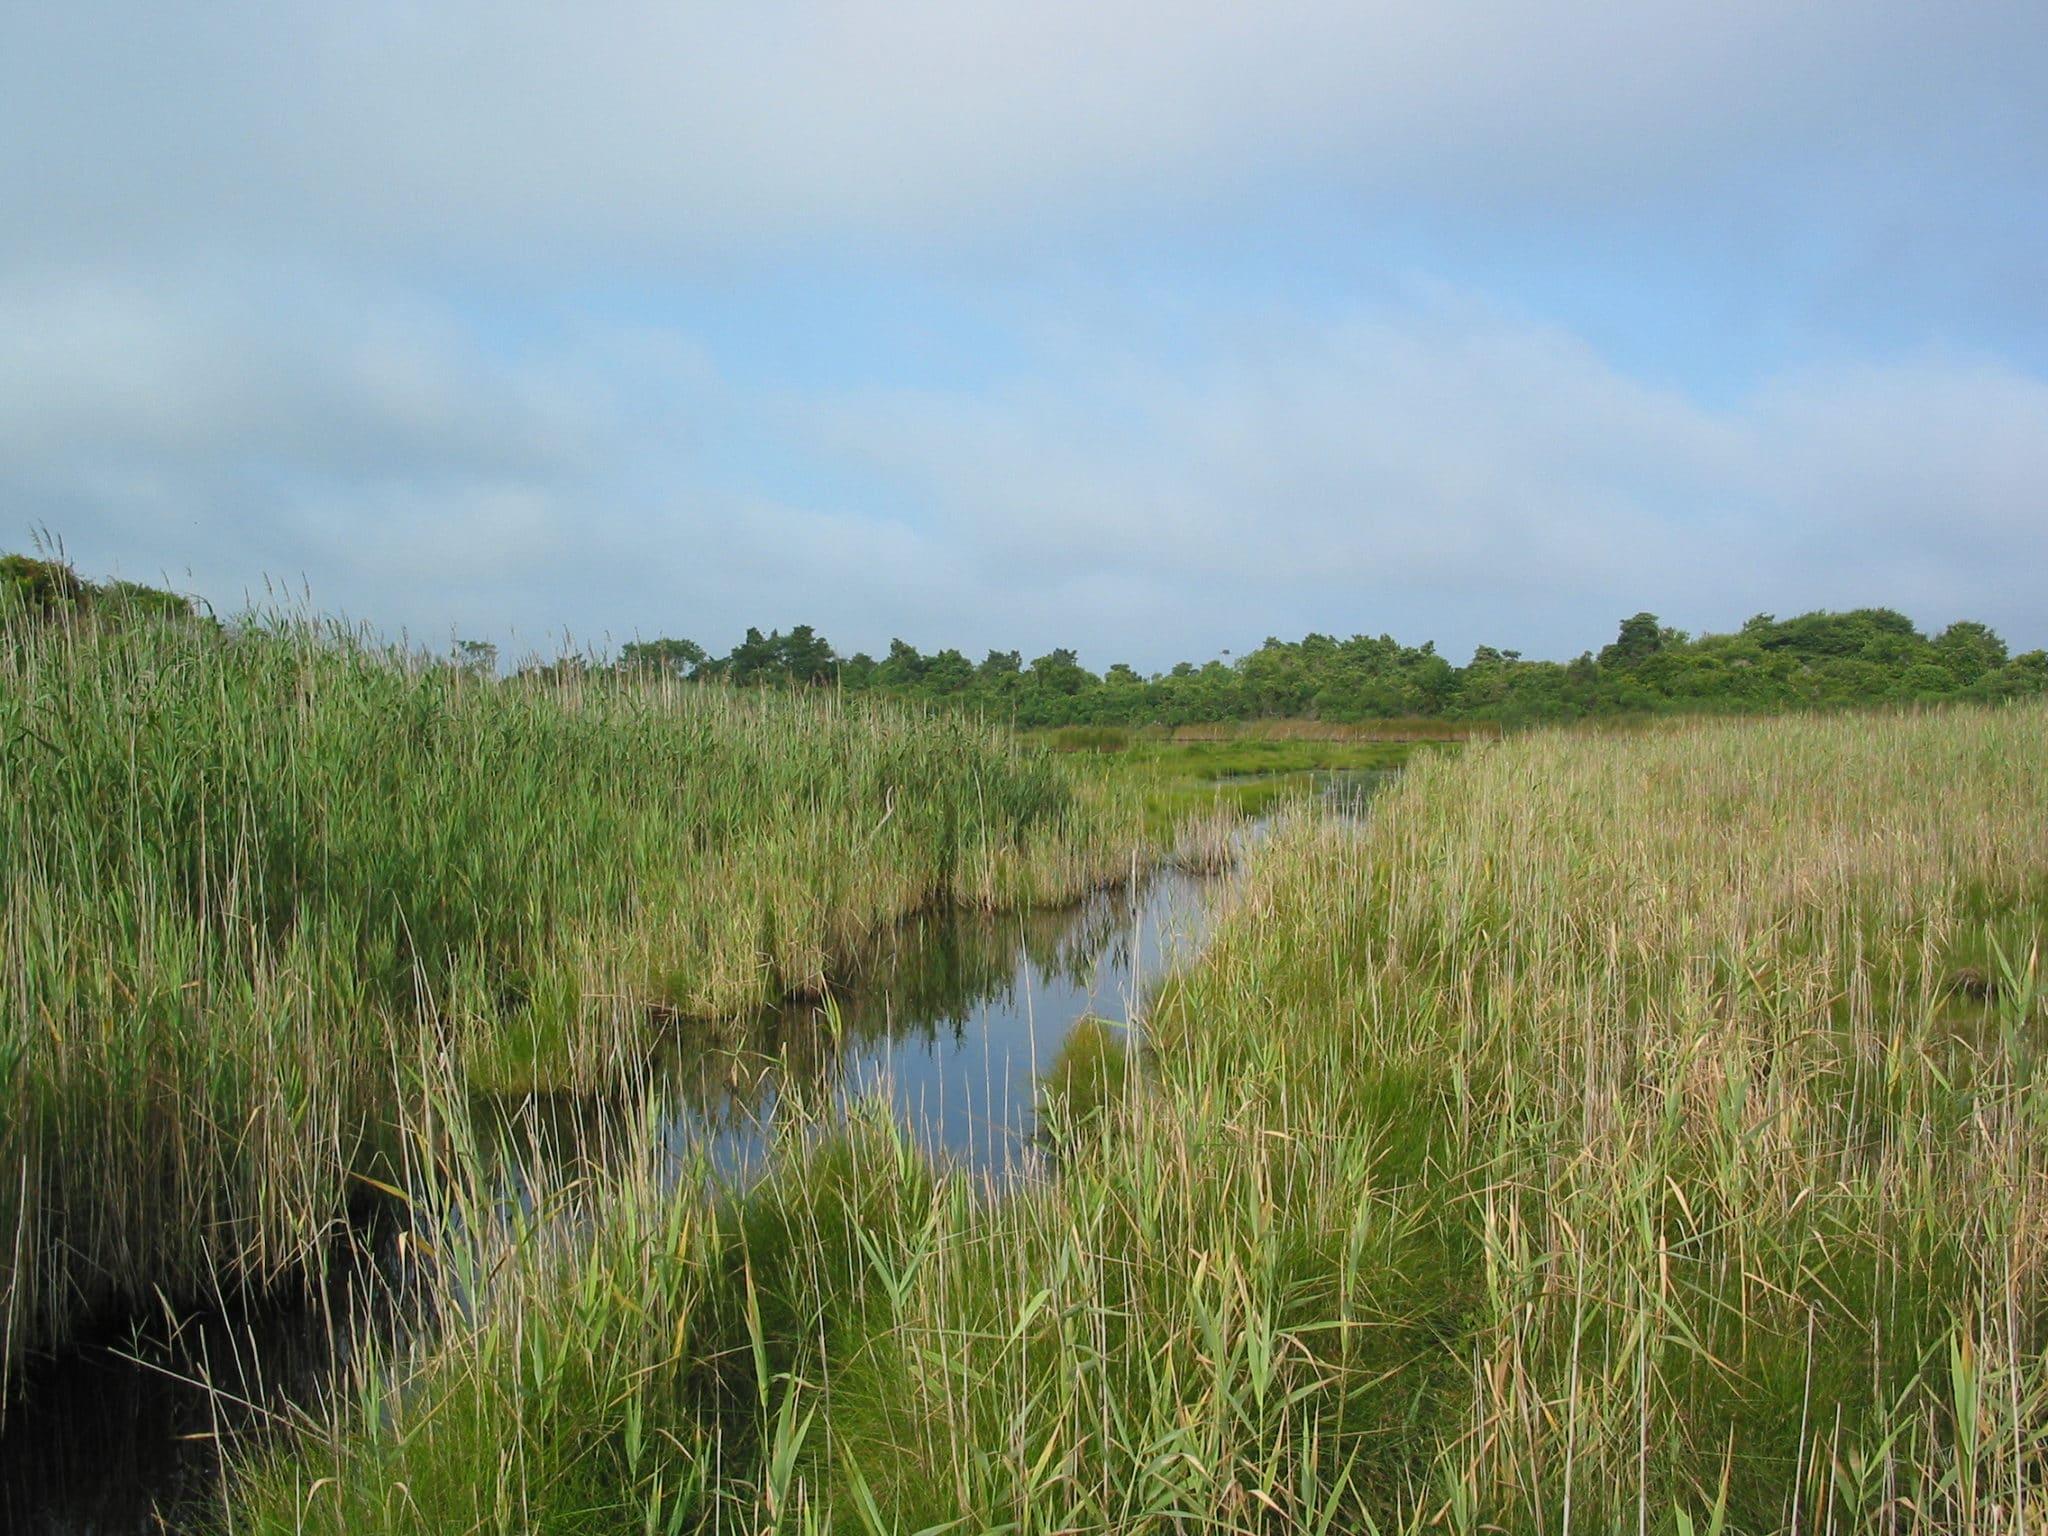 Medouie Creek, dominated by the non-native grass Phragmites australis